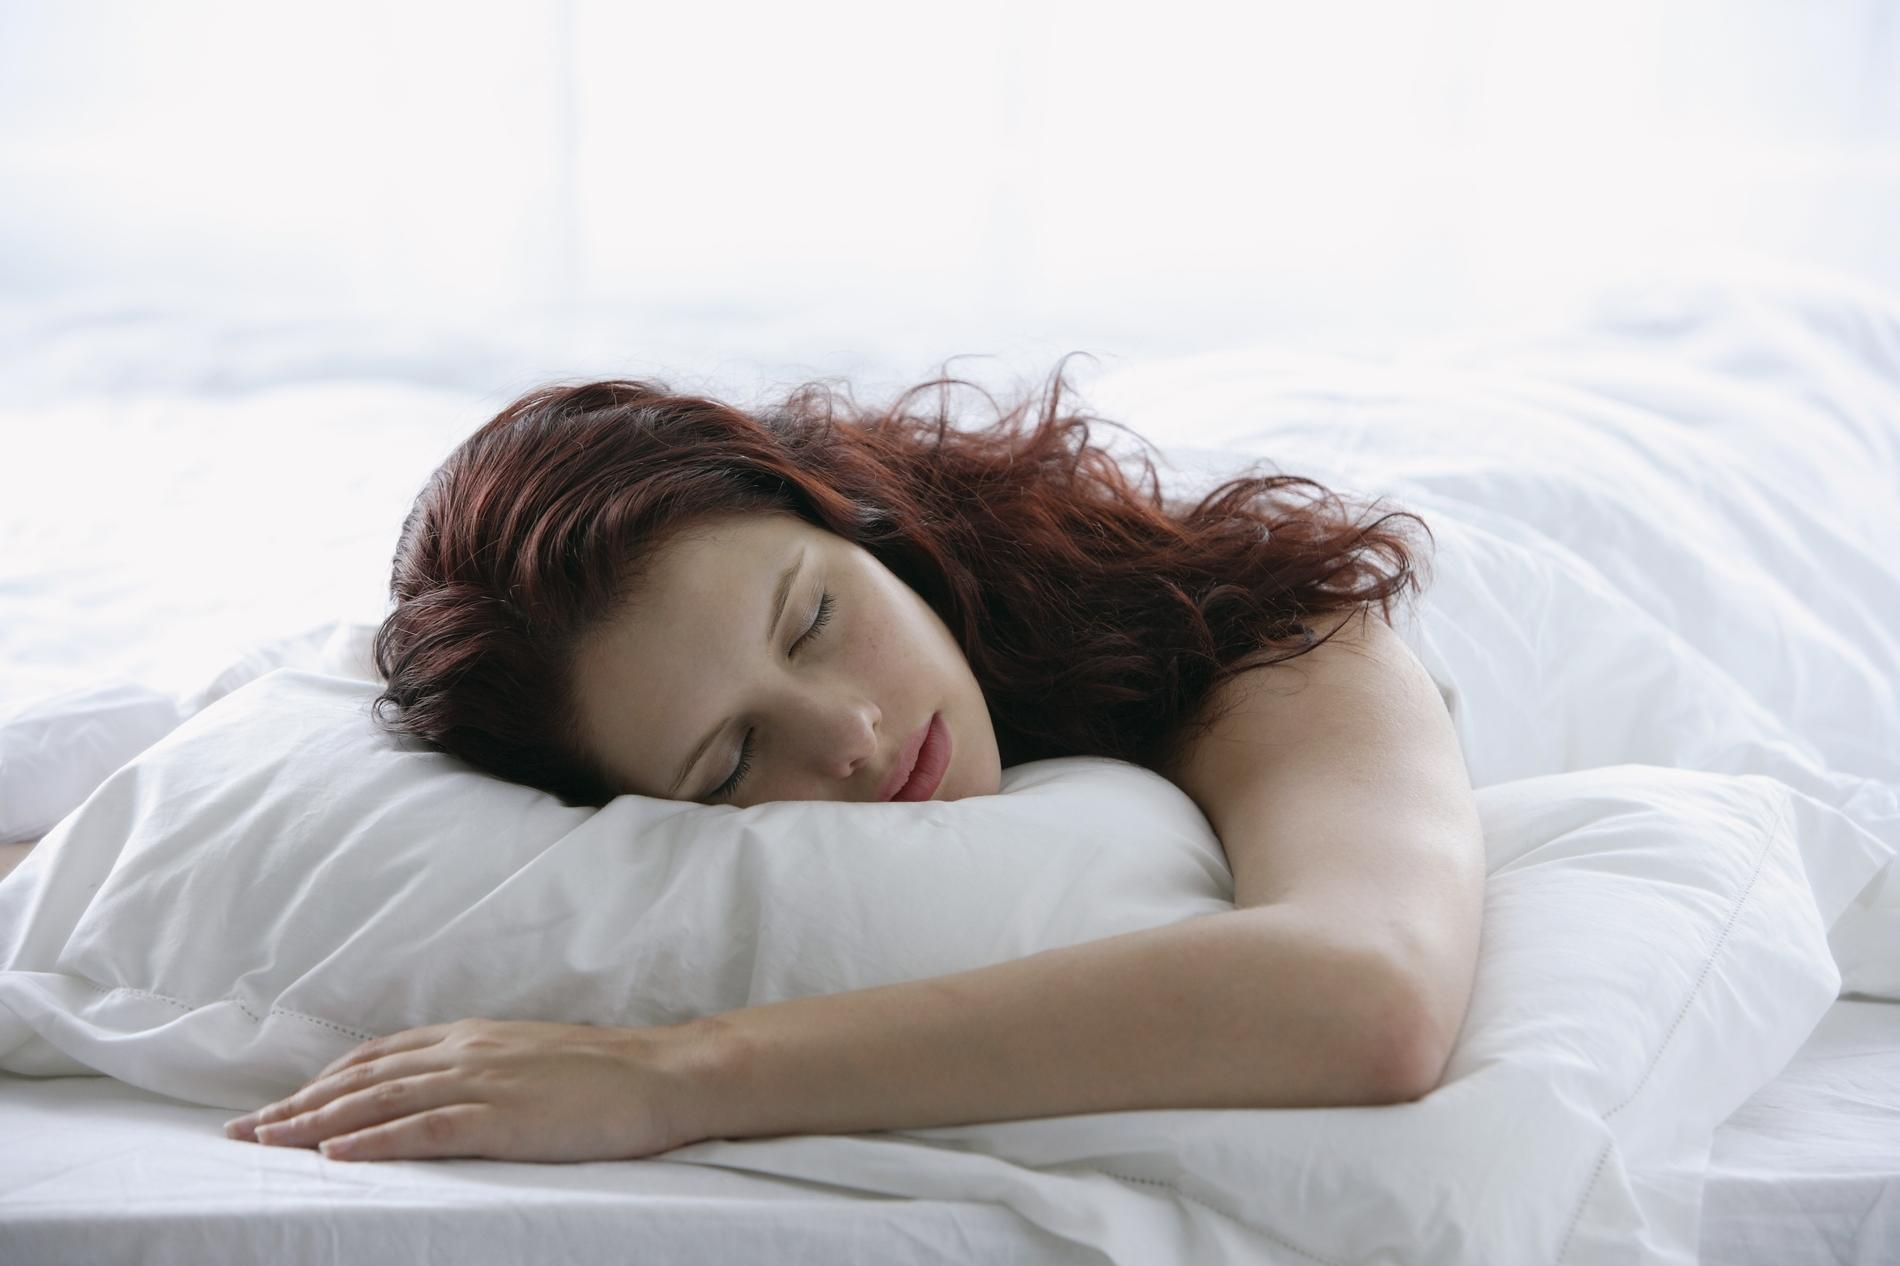 ces mauvaises habitudes qui ruinent notre sommeil madame figaro. Black Bedroom Furniture Sets. Home Design Ideas